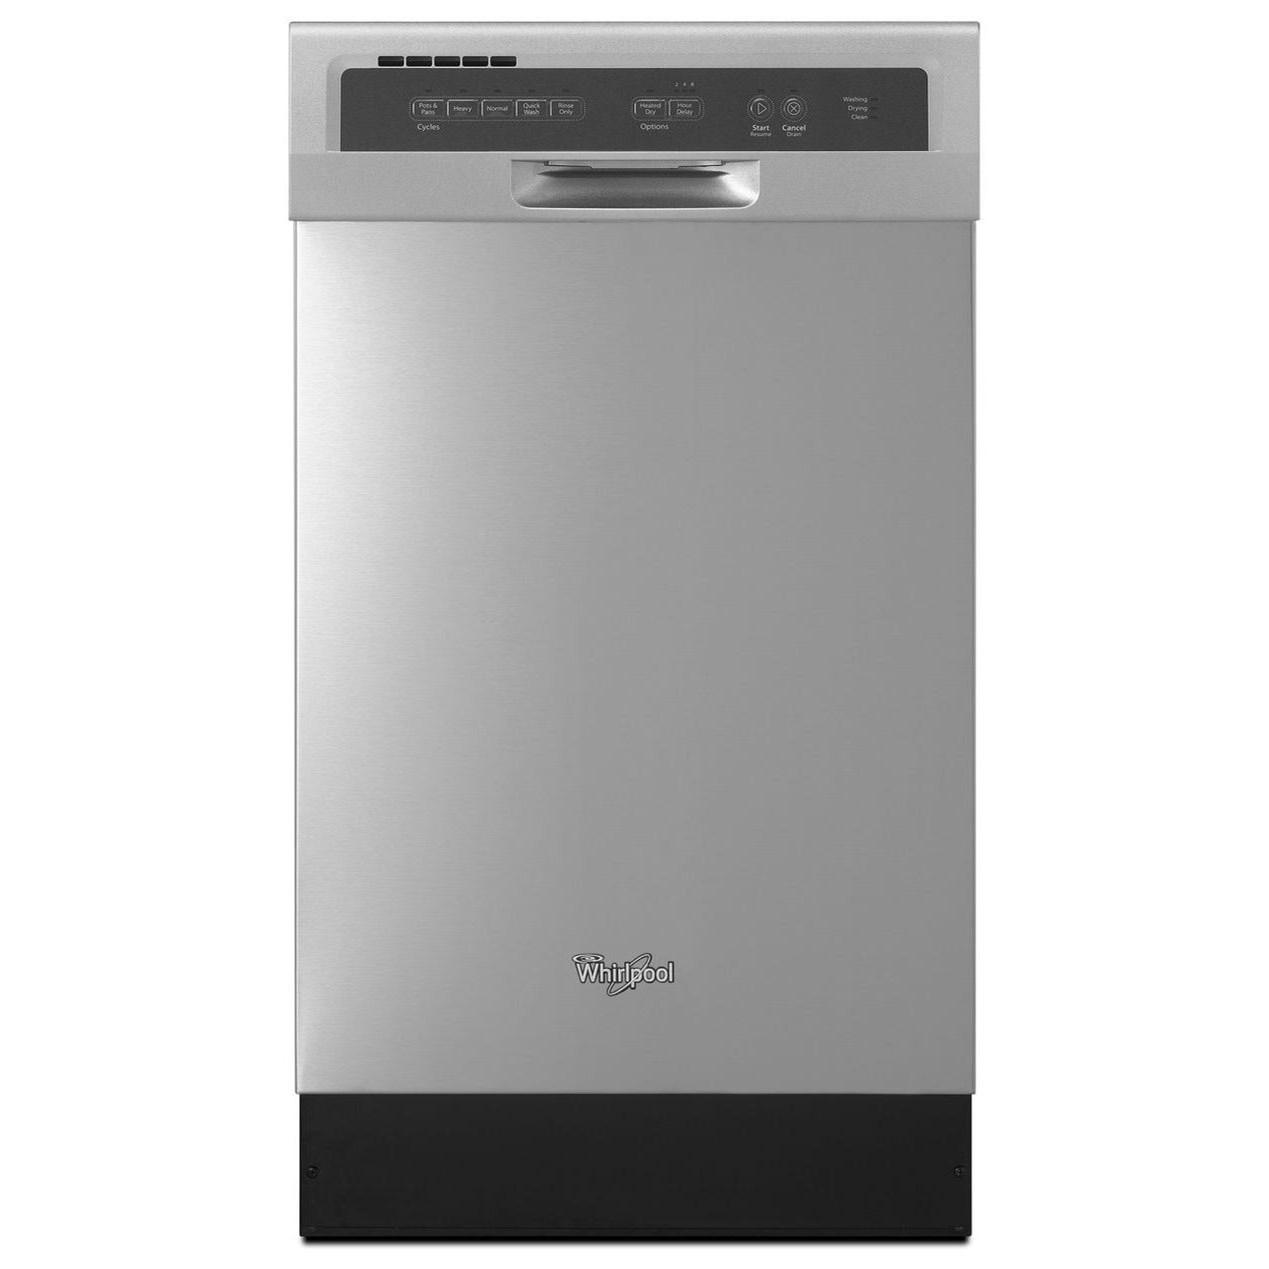 Whirlpool Dishwashers - Whirlpool Compact Tall Tub Dishwasher - Item Number: WDF518SAFM